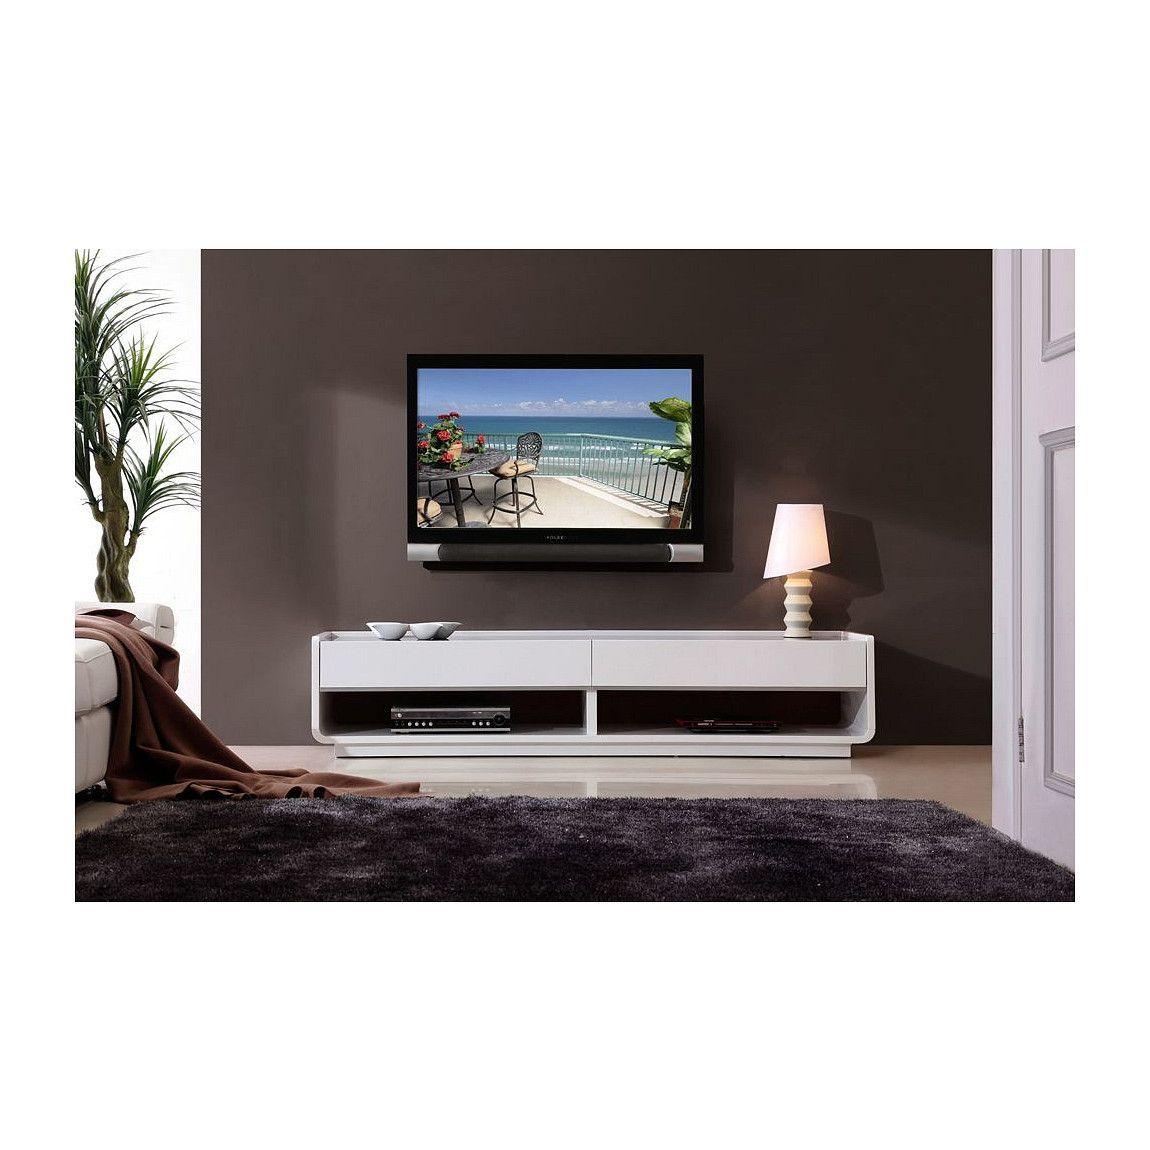 b modern designer tv stand. b modern designer tv stand  products  pinterest  tv stands tvs